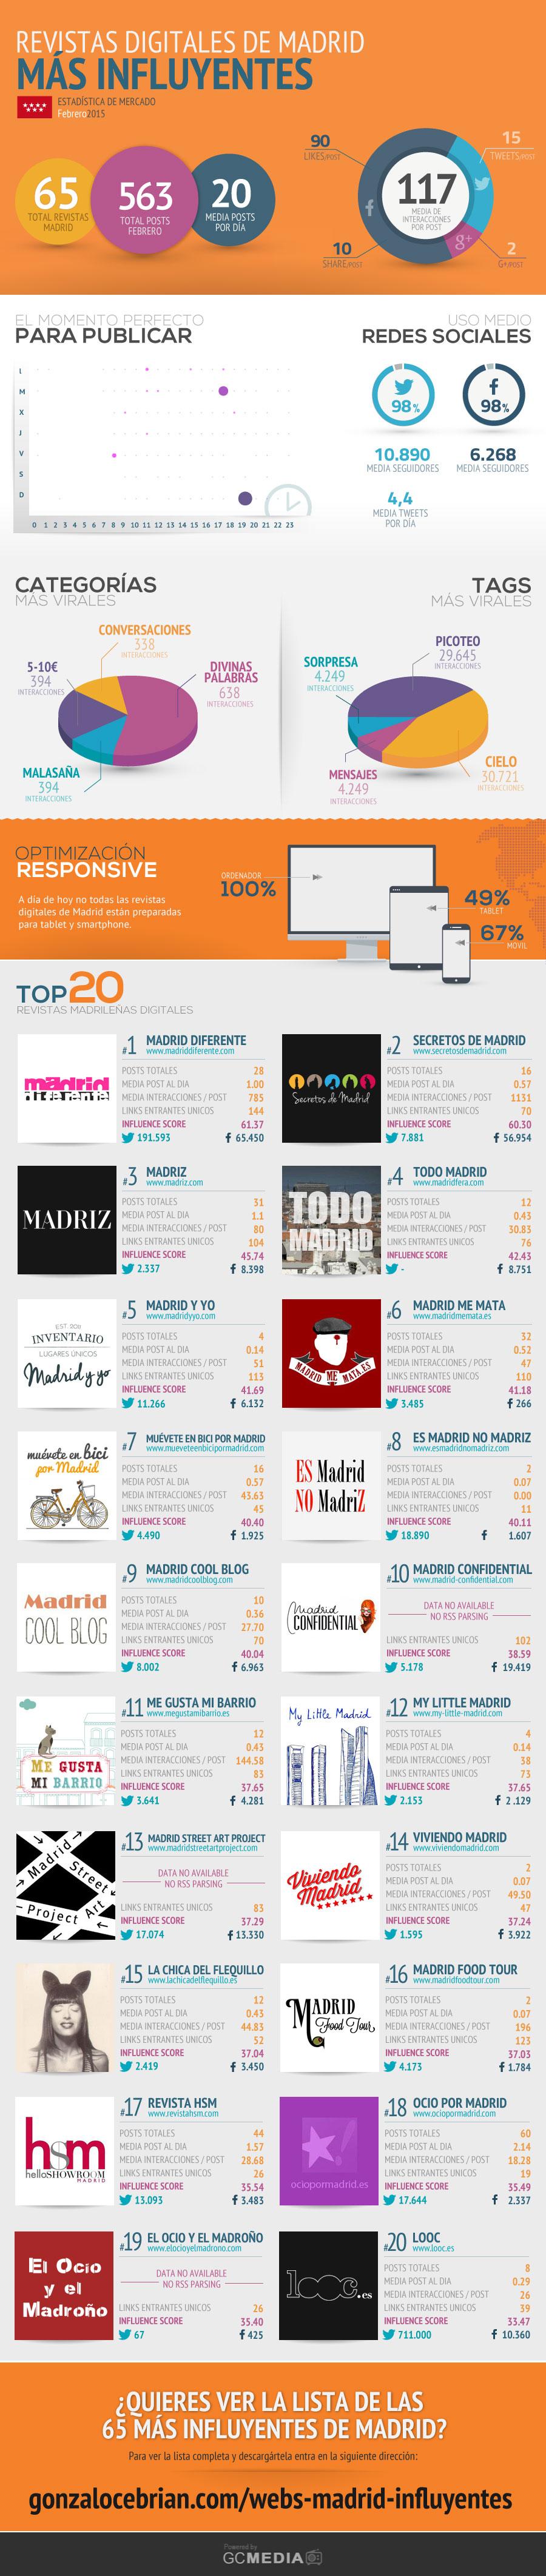 WEBS-MADRID-INFLUYENTES-Feb2015